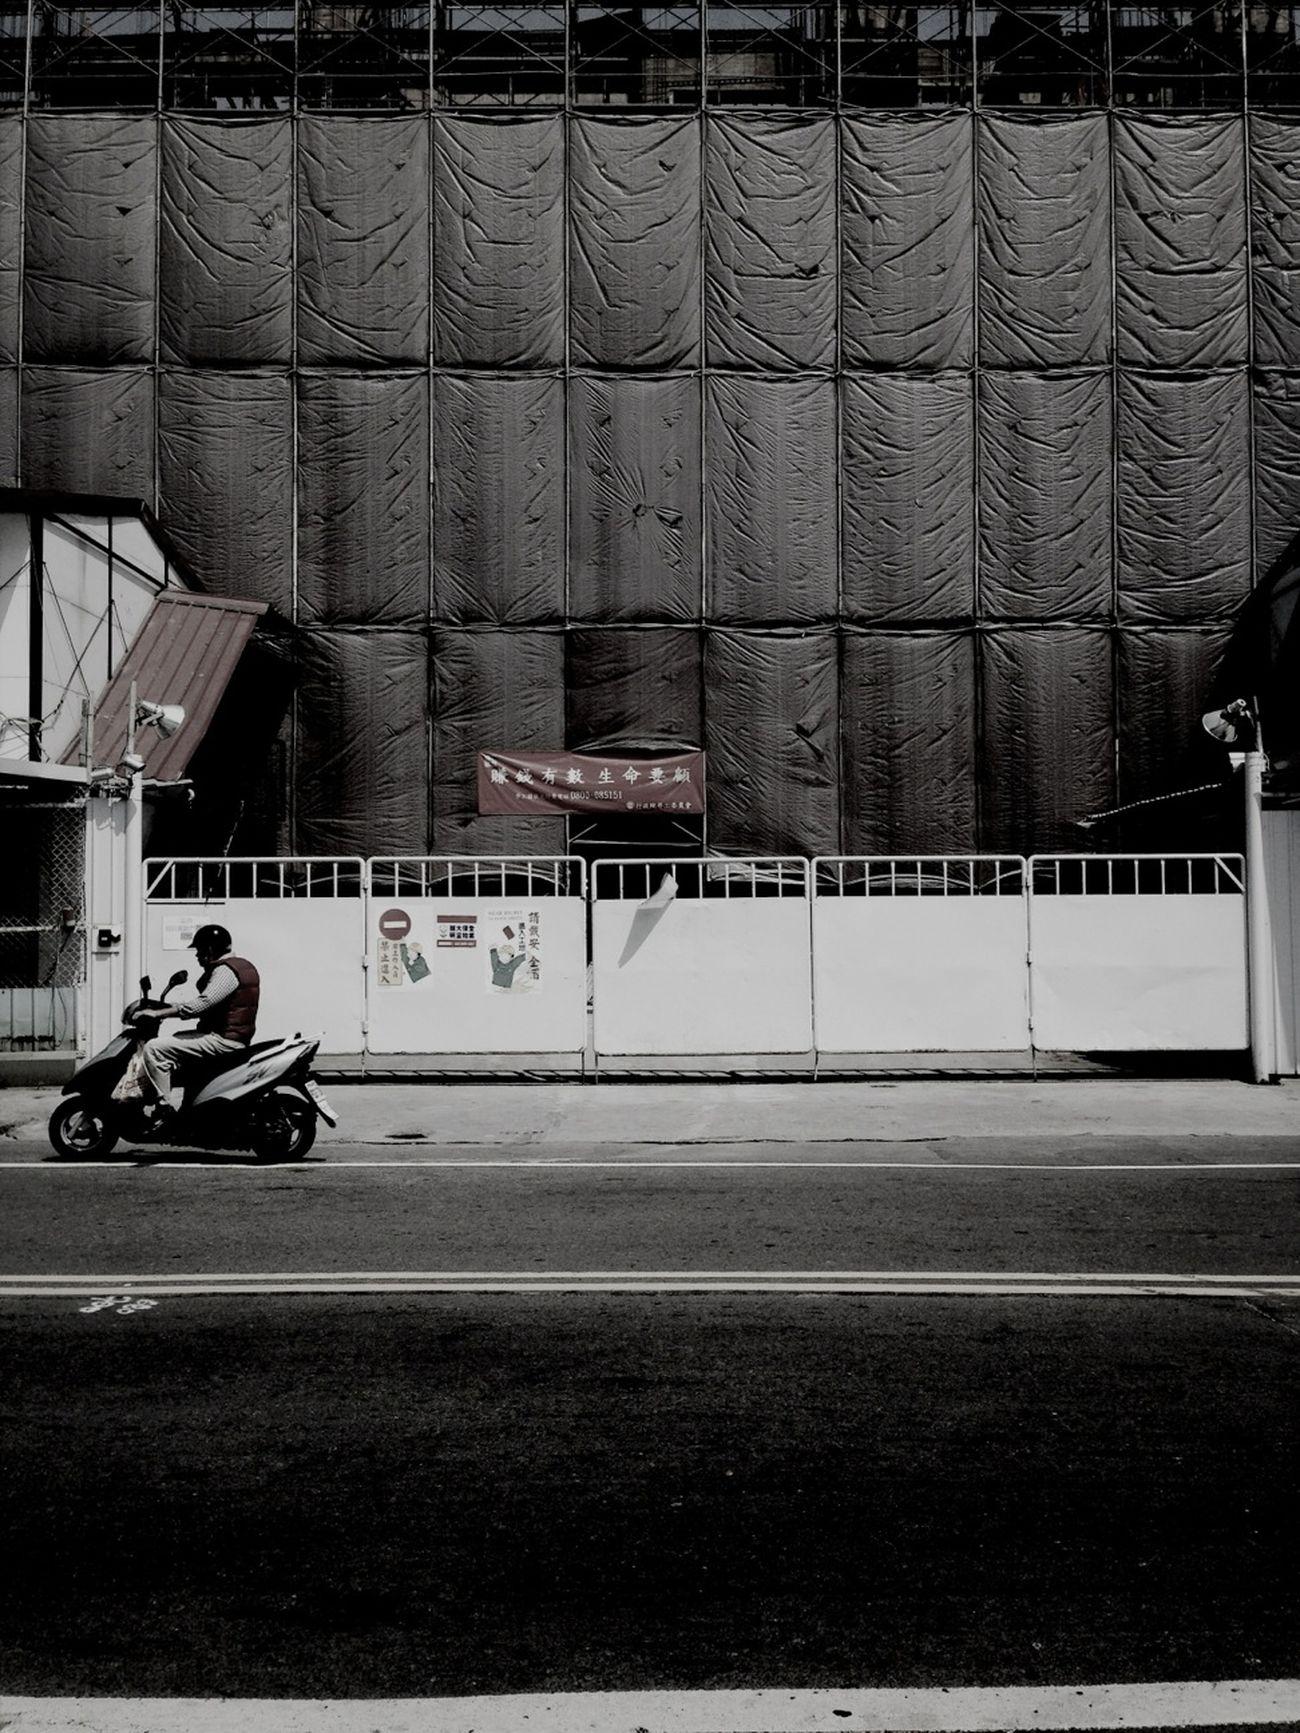 Snapshot Blackandwhite Monochrome Vocscam